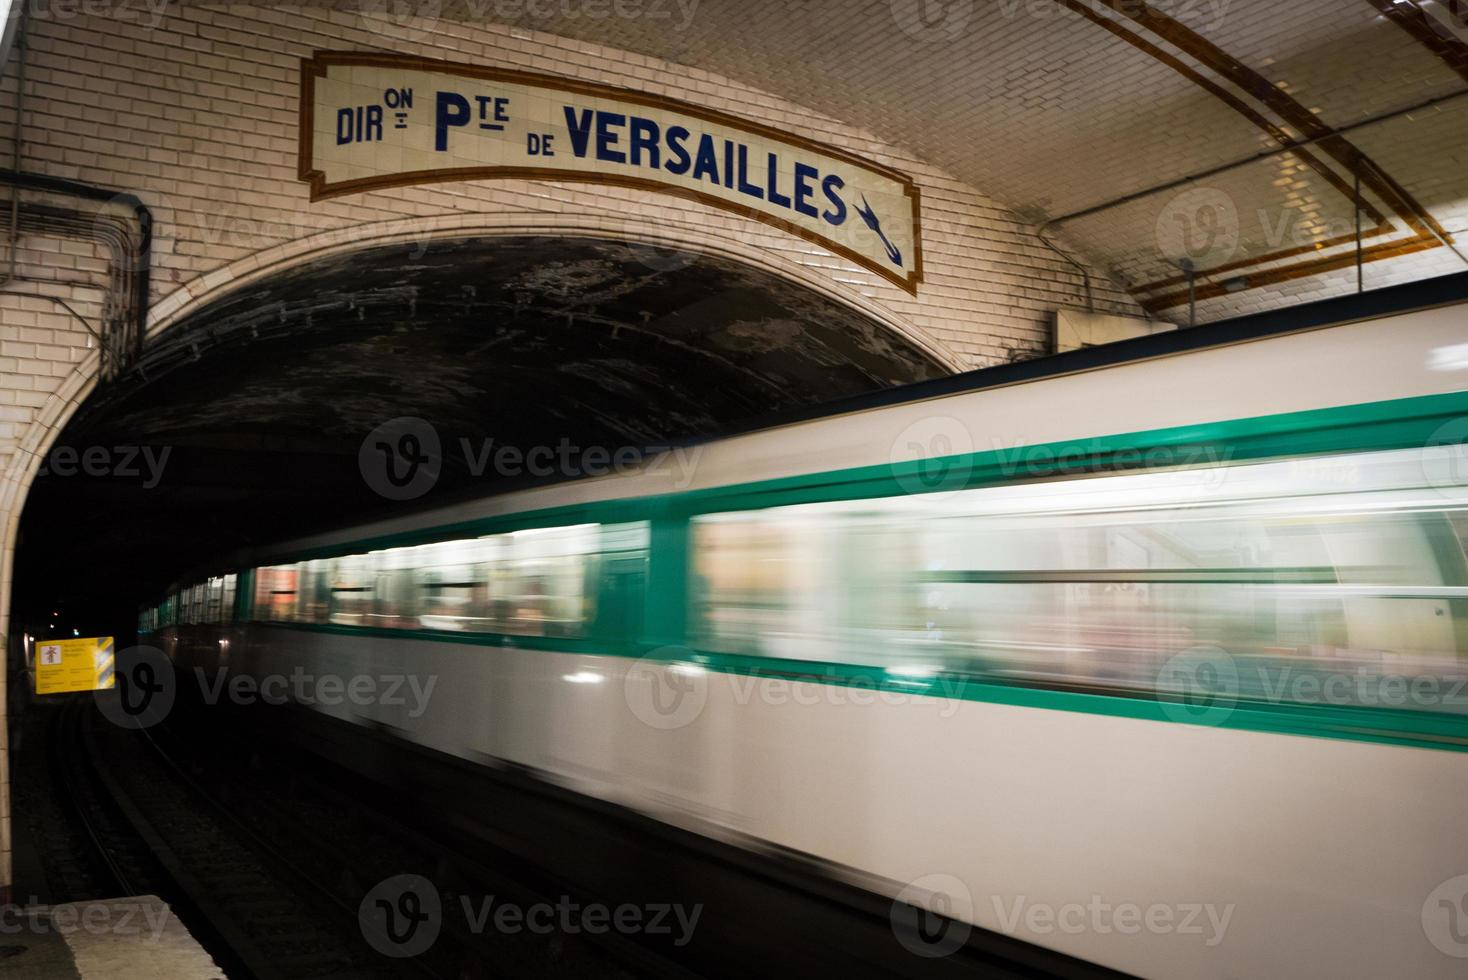 Paris underground, at Pte. de Versailles stop photo